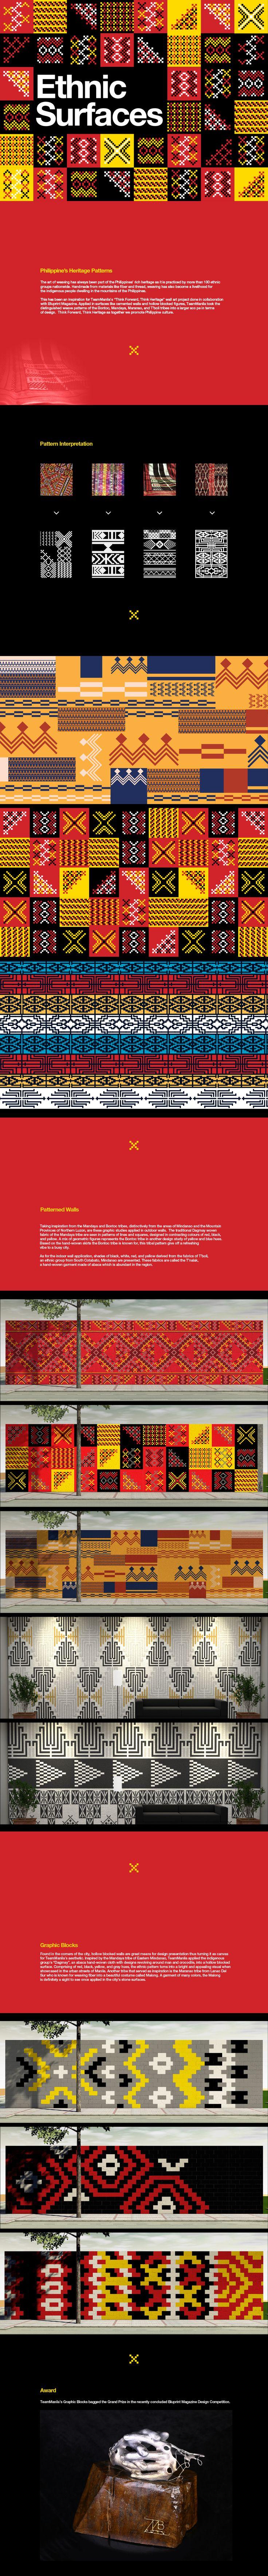 Philippine's Heritage Patterns